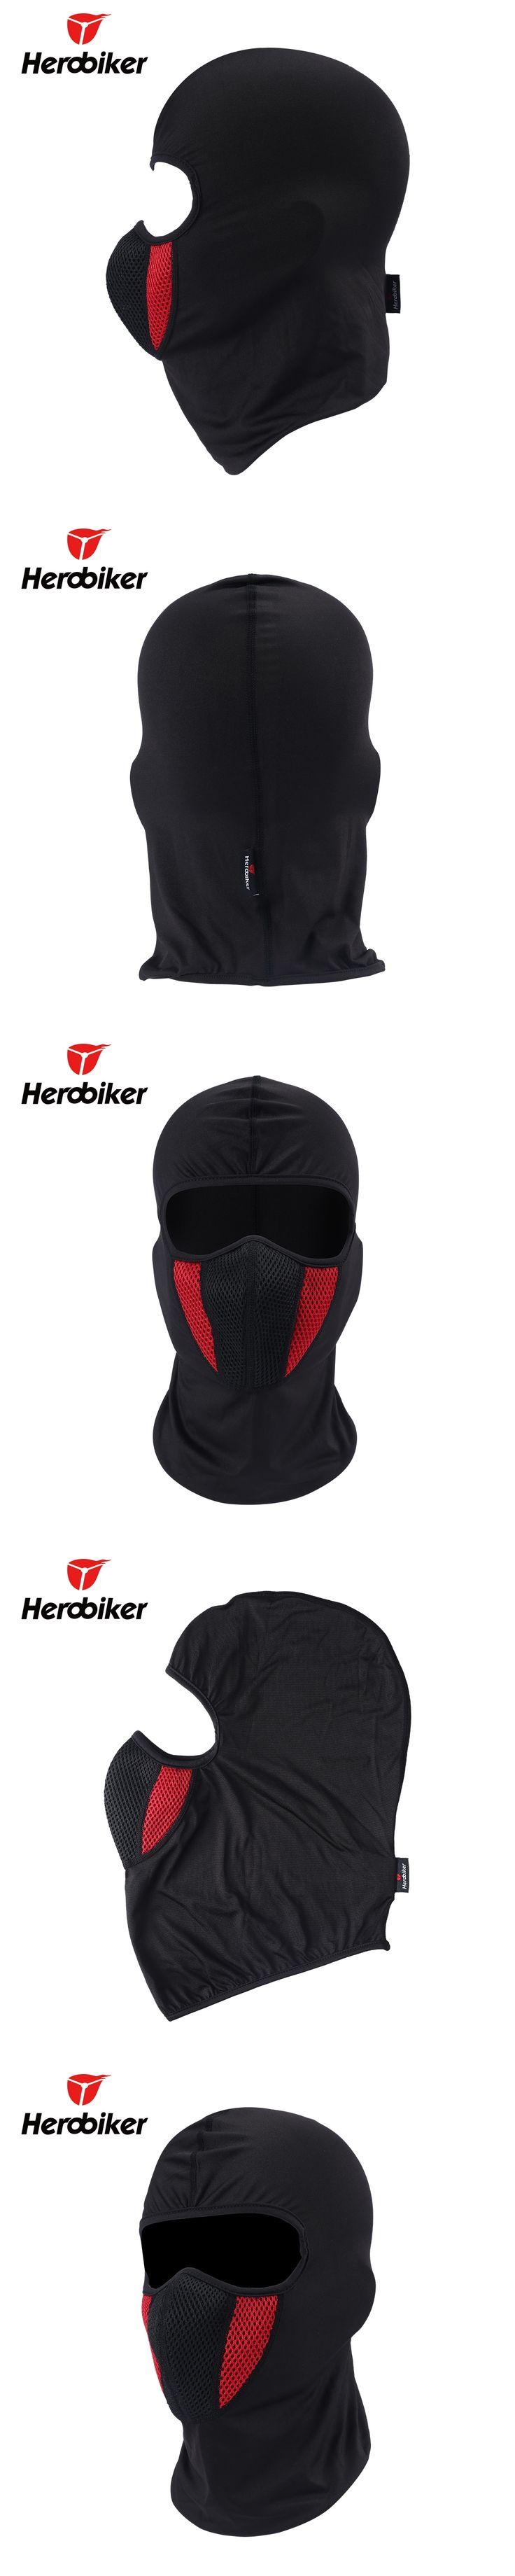 2017 HEROBIKER Men's Motorcycle Face Mask Outdoor Pro Street Windproof Dustproof Motorcycle Riding Neck Face Mask Moto Balaclava